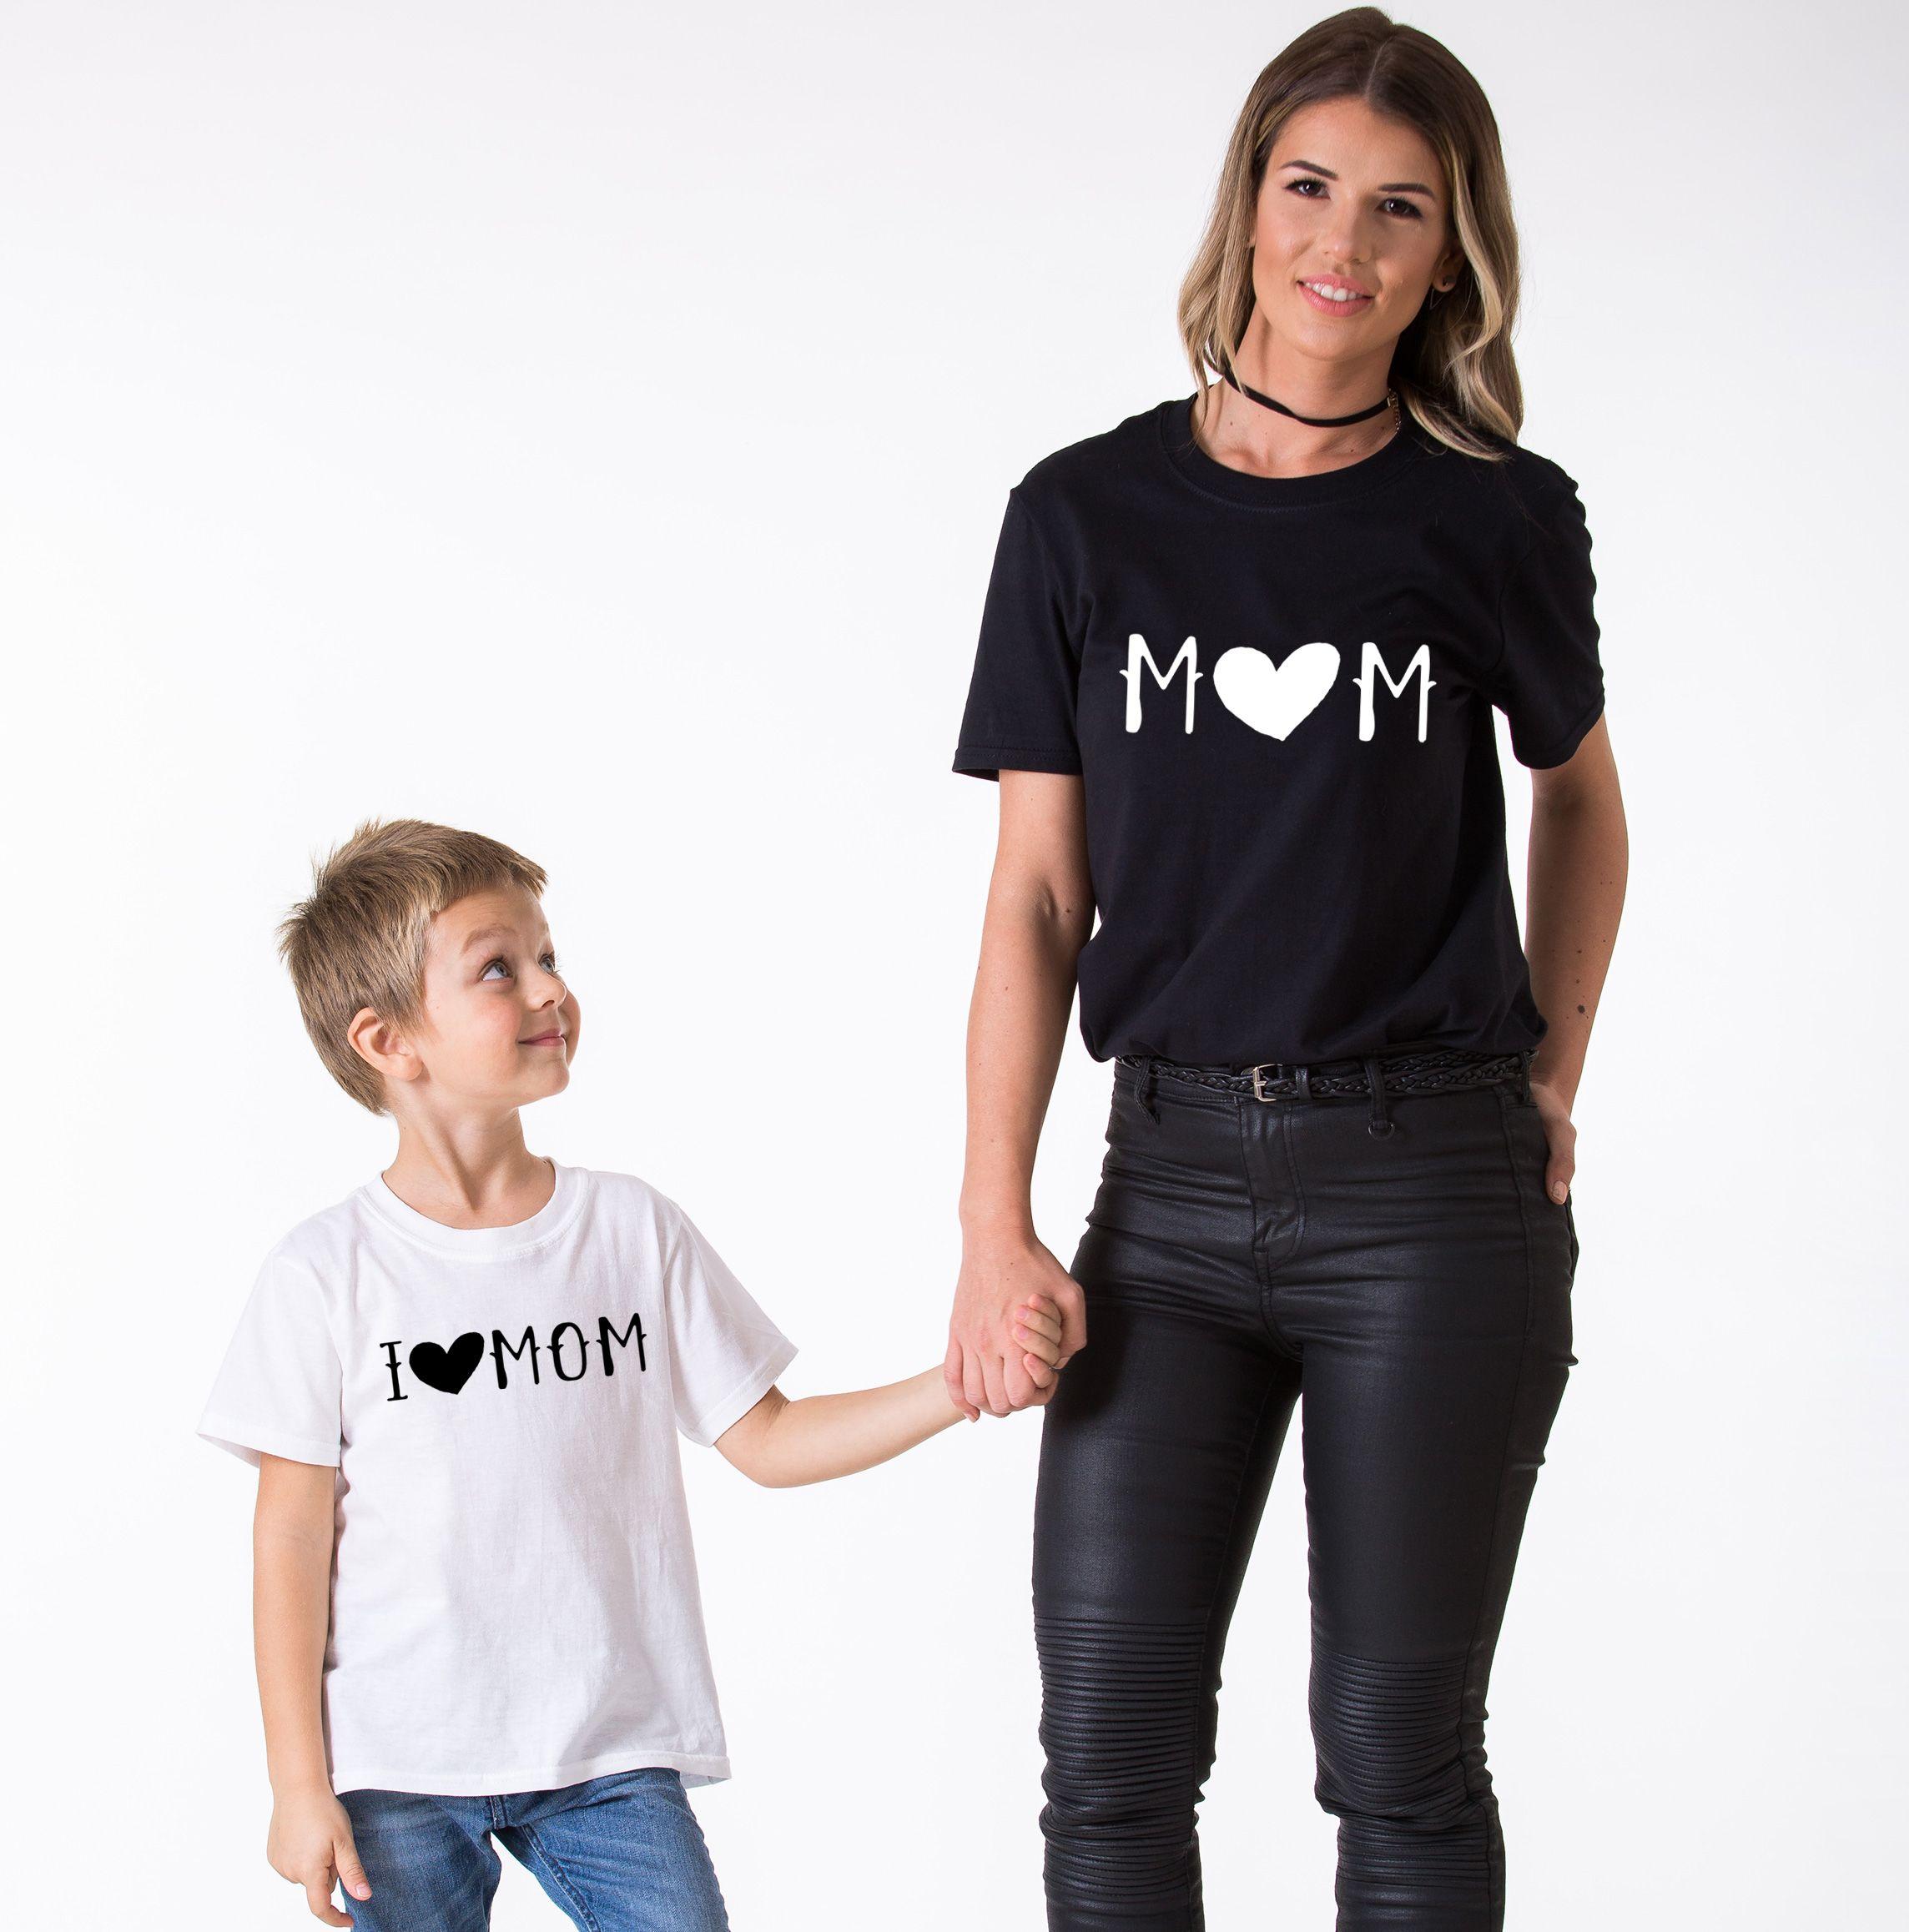 I Love Mom Shirt Mom Shirt Matching Mommy And Me Shirts